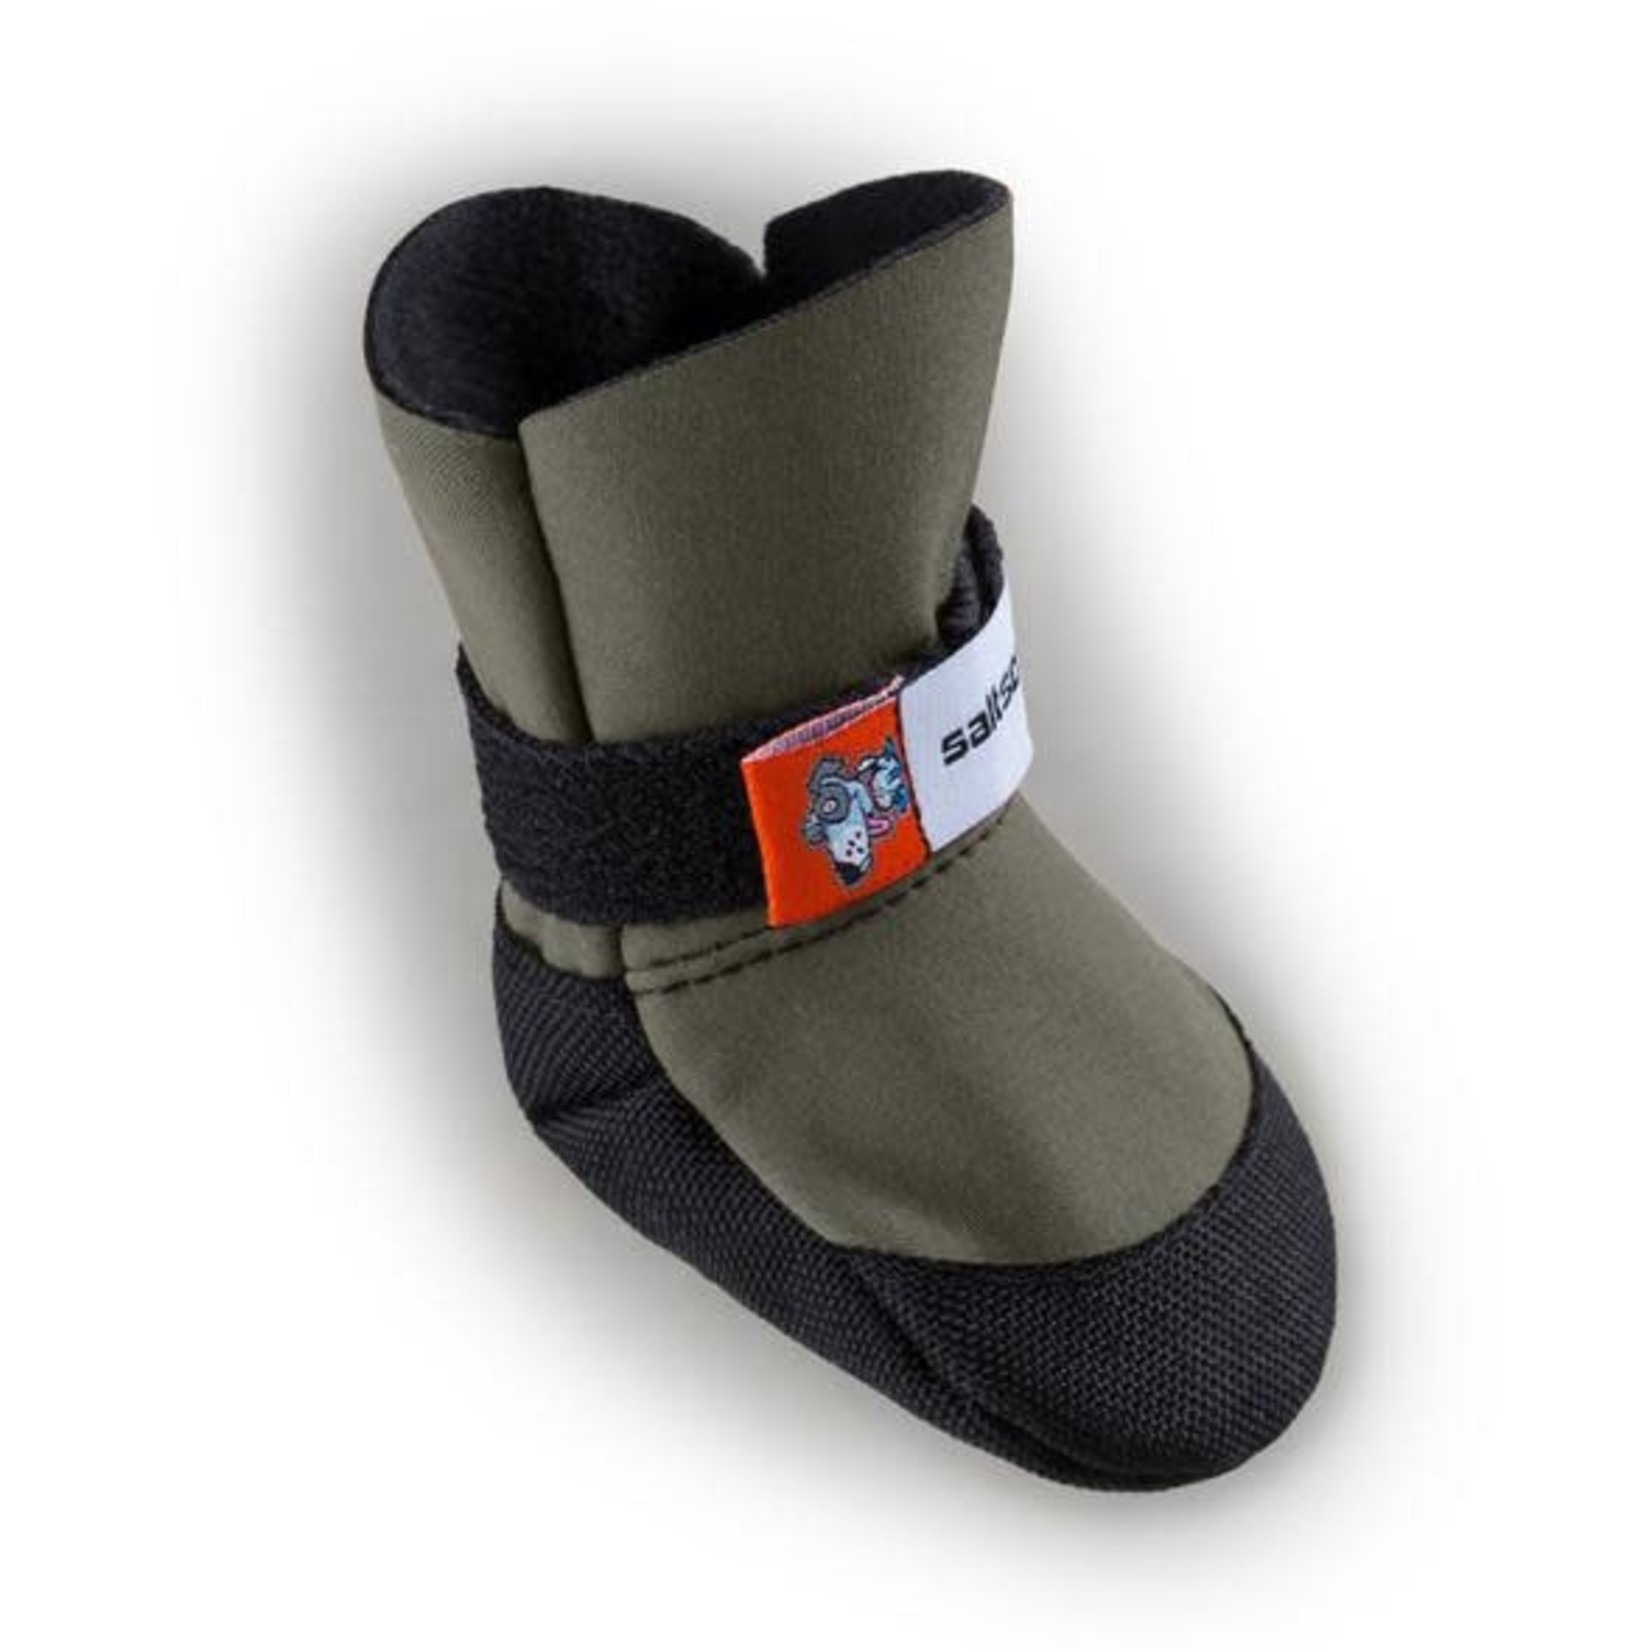 Saltsox Saltsox Boots X-Large Ice Breaker Gray